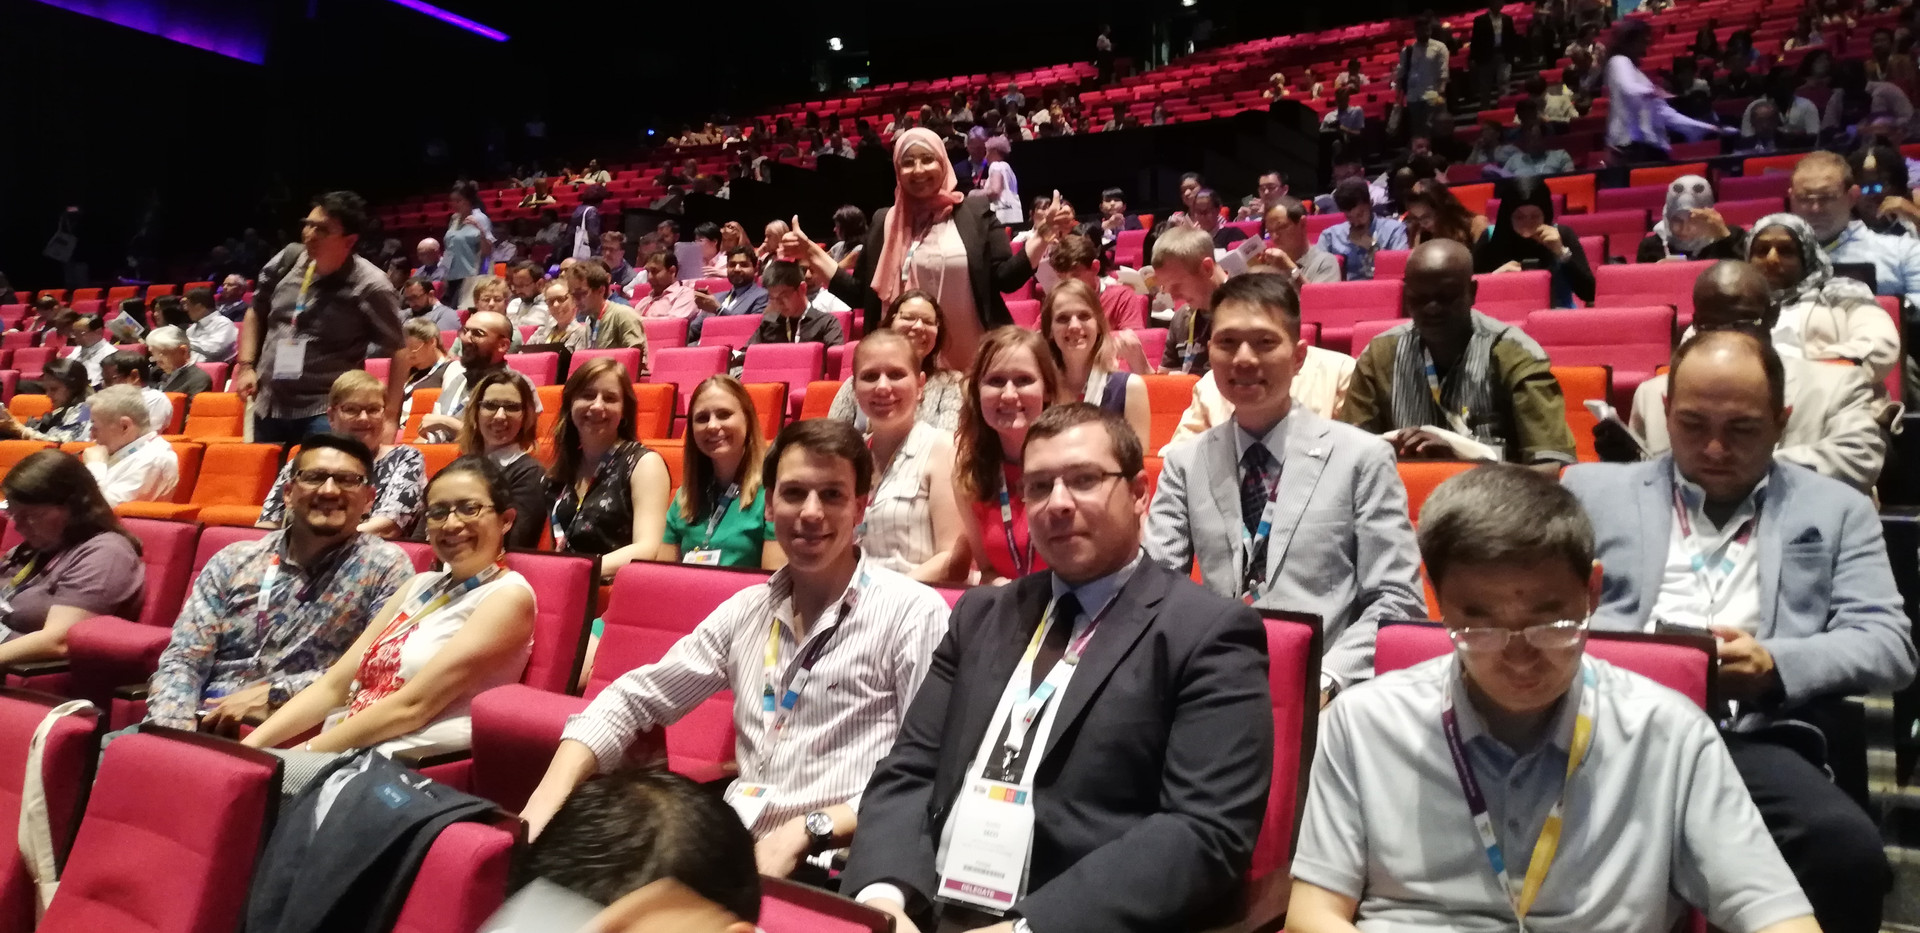 IYCN members attending IUPAC2019 in Paris